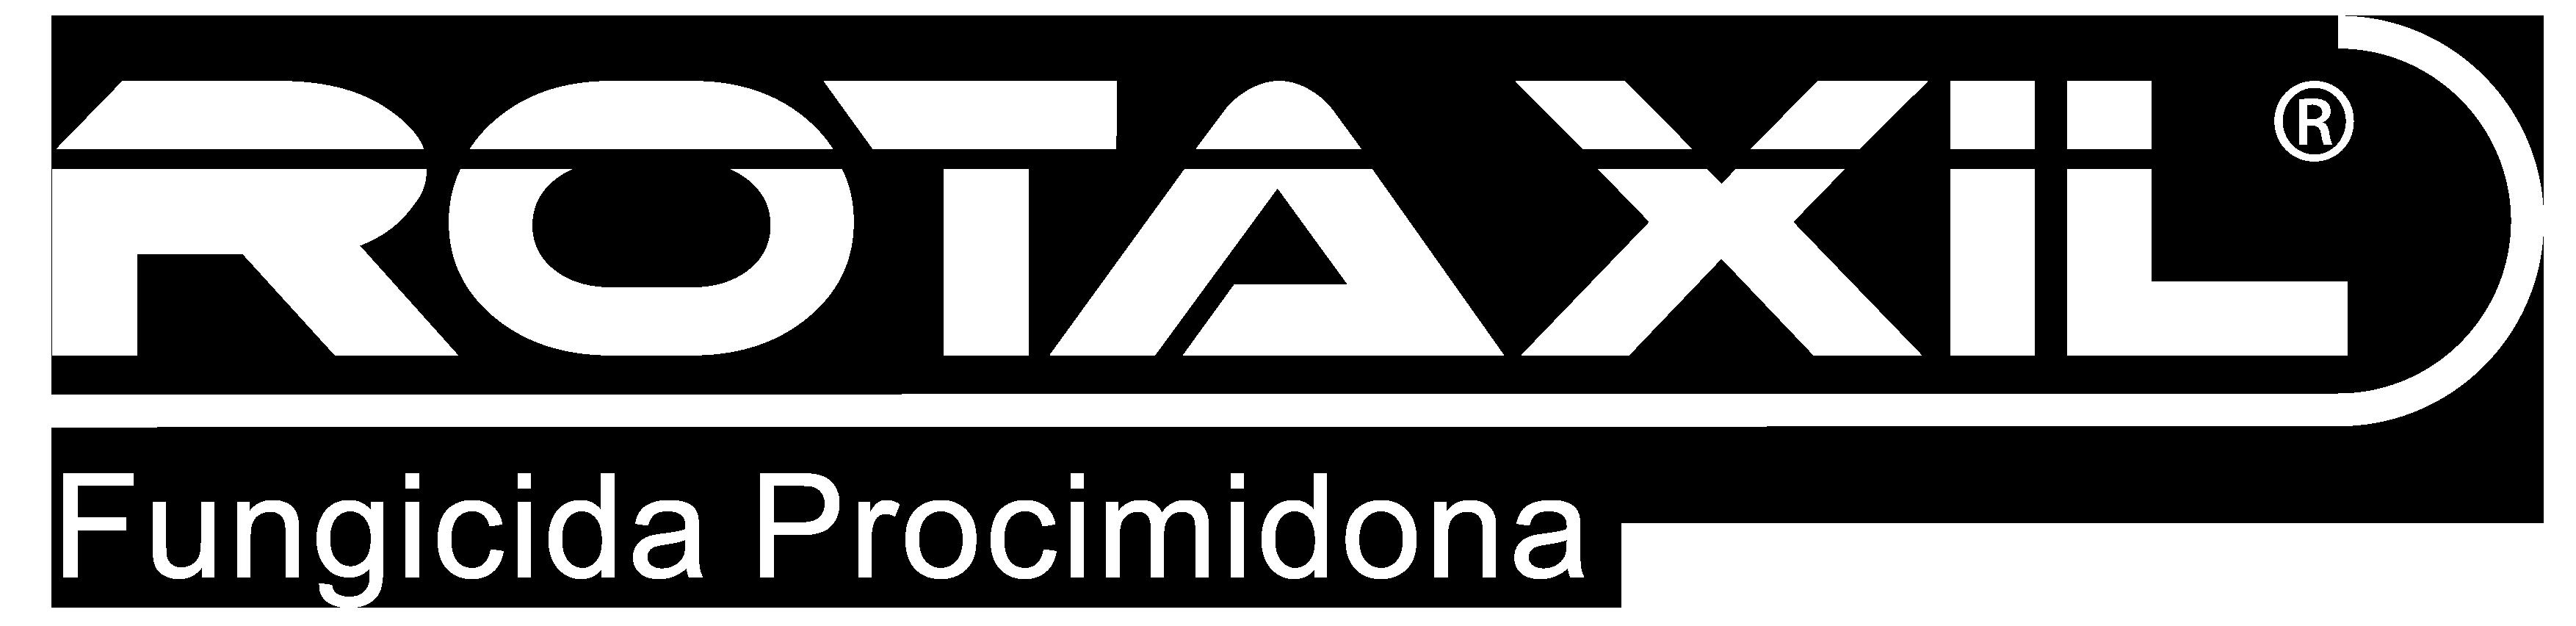 RTM_Brazil_ProductLogo_White_Rotaxil